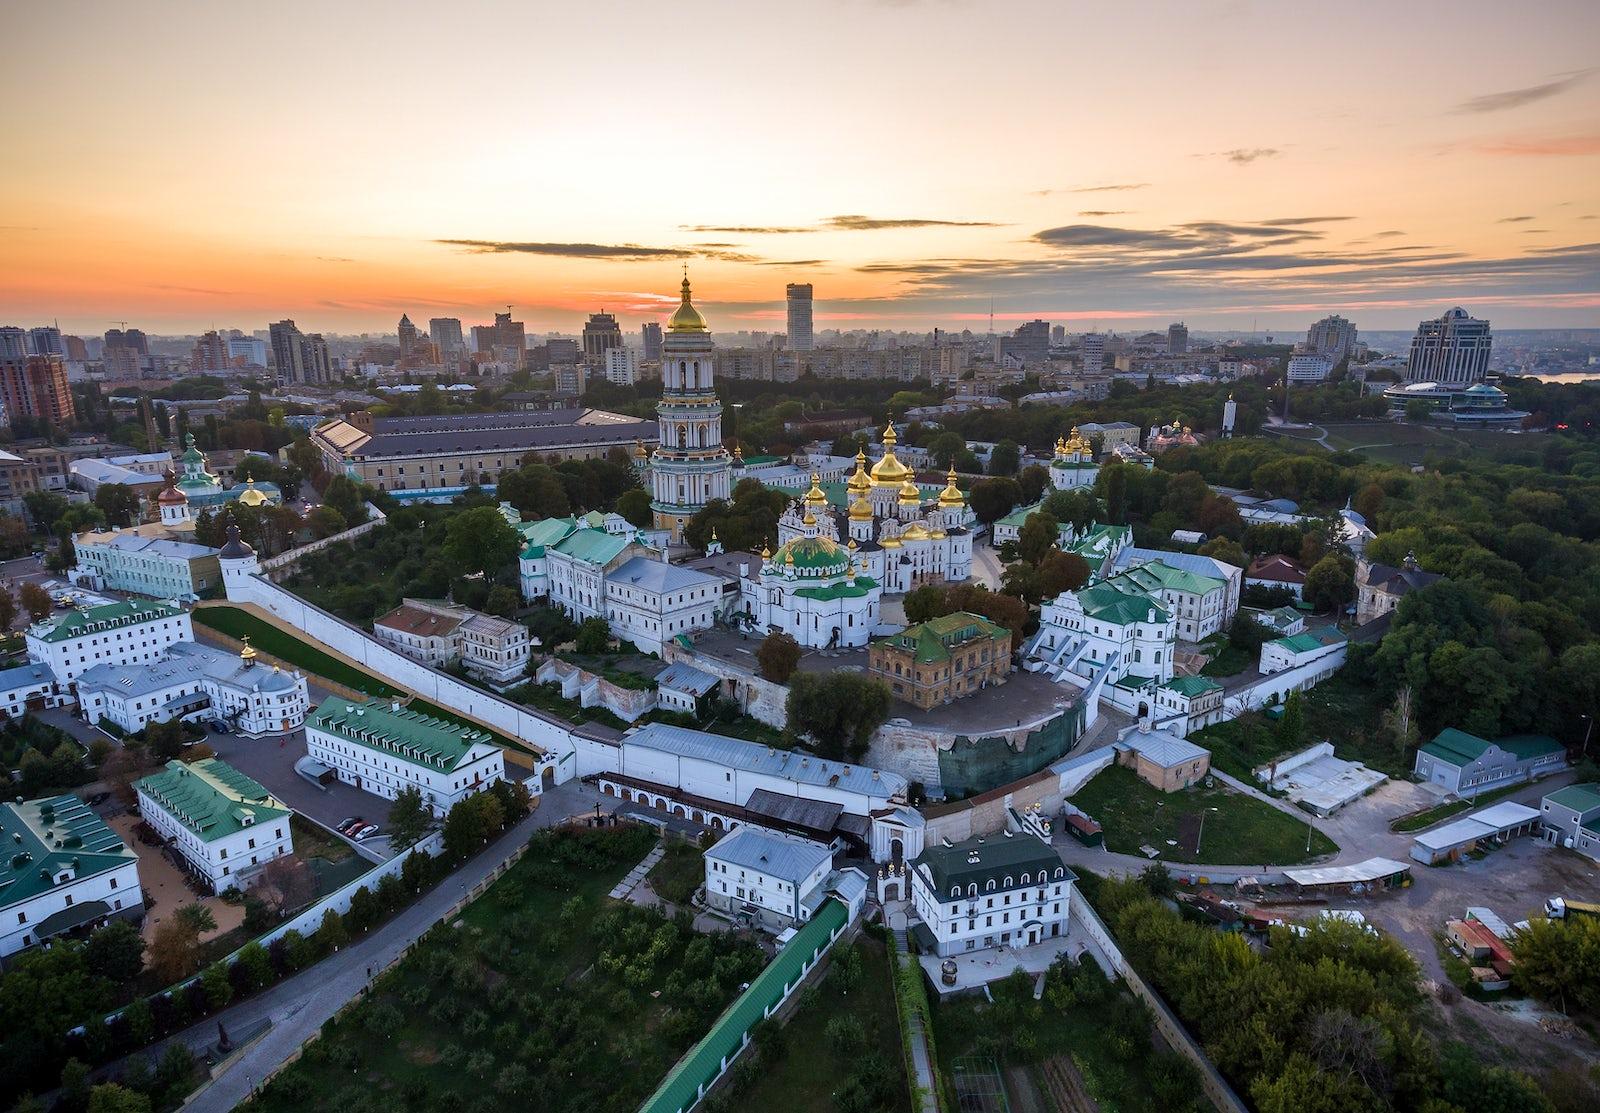 © iStock /Dmytro Kosmenko